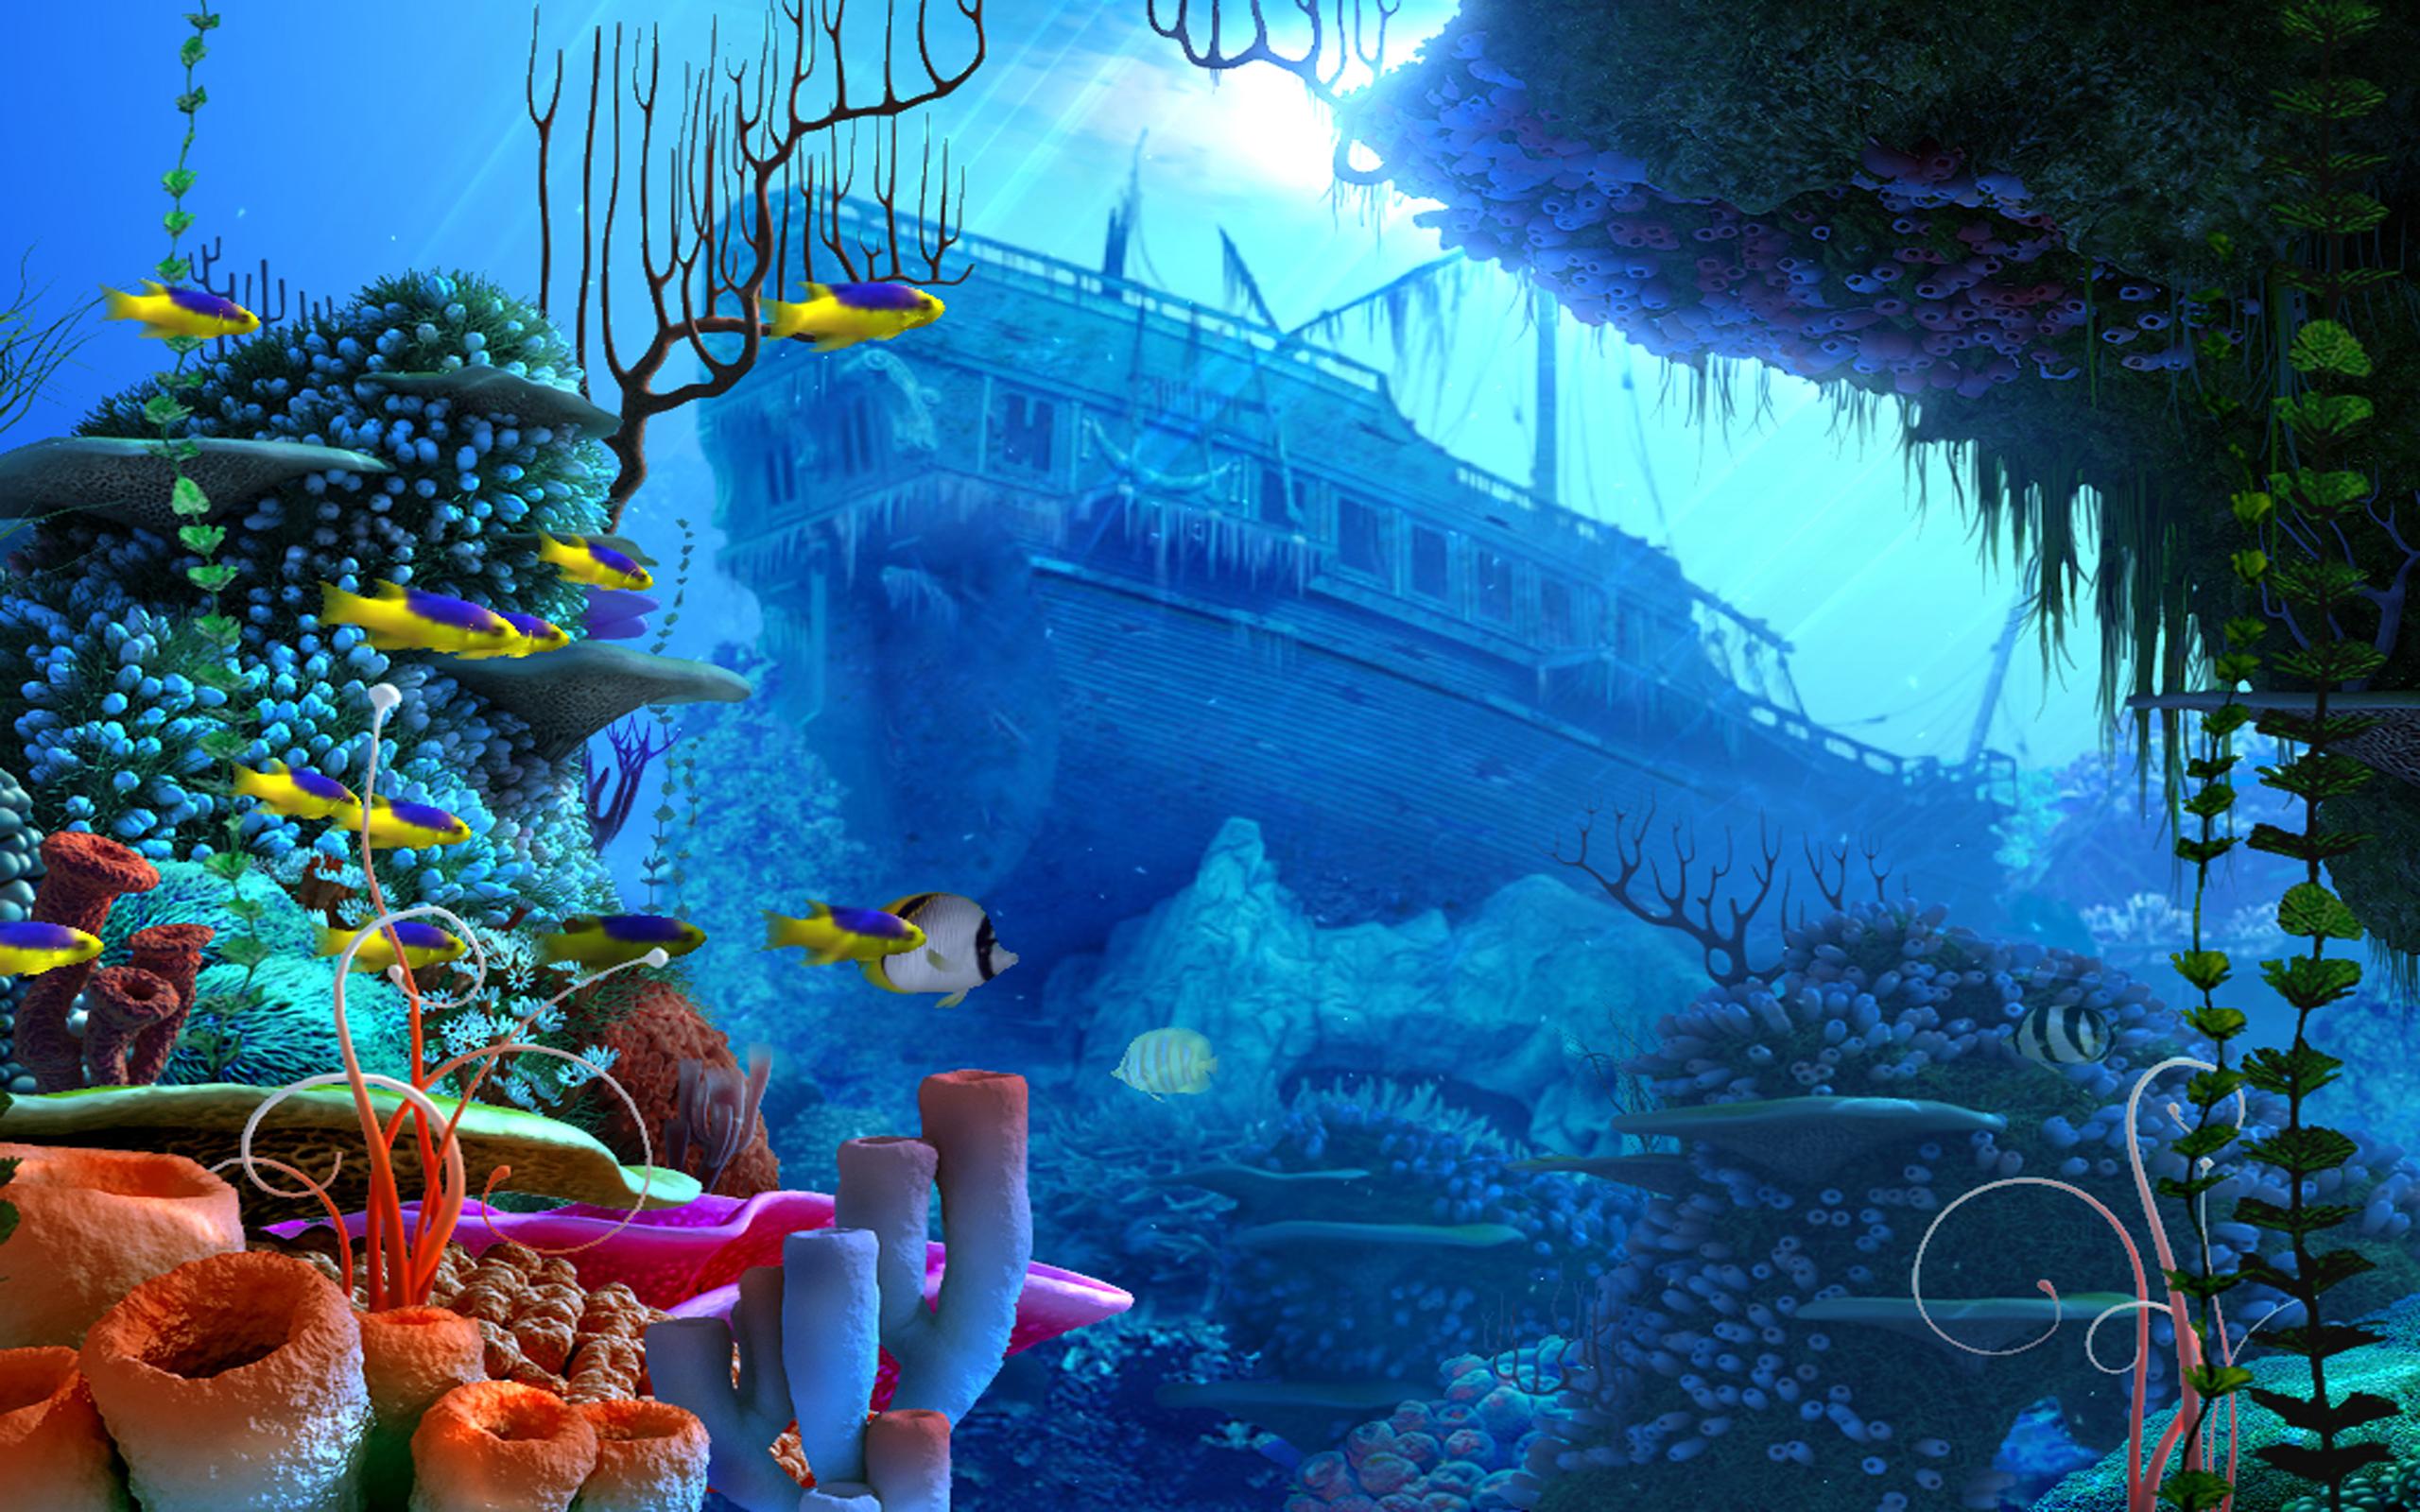 pirates pirate fantasy ship fish ocean underwater wallpaper background 2560x1600